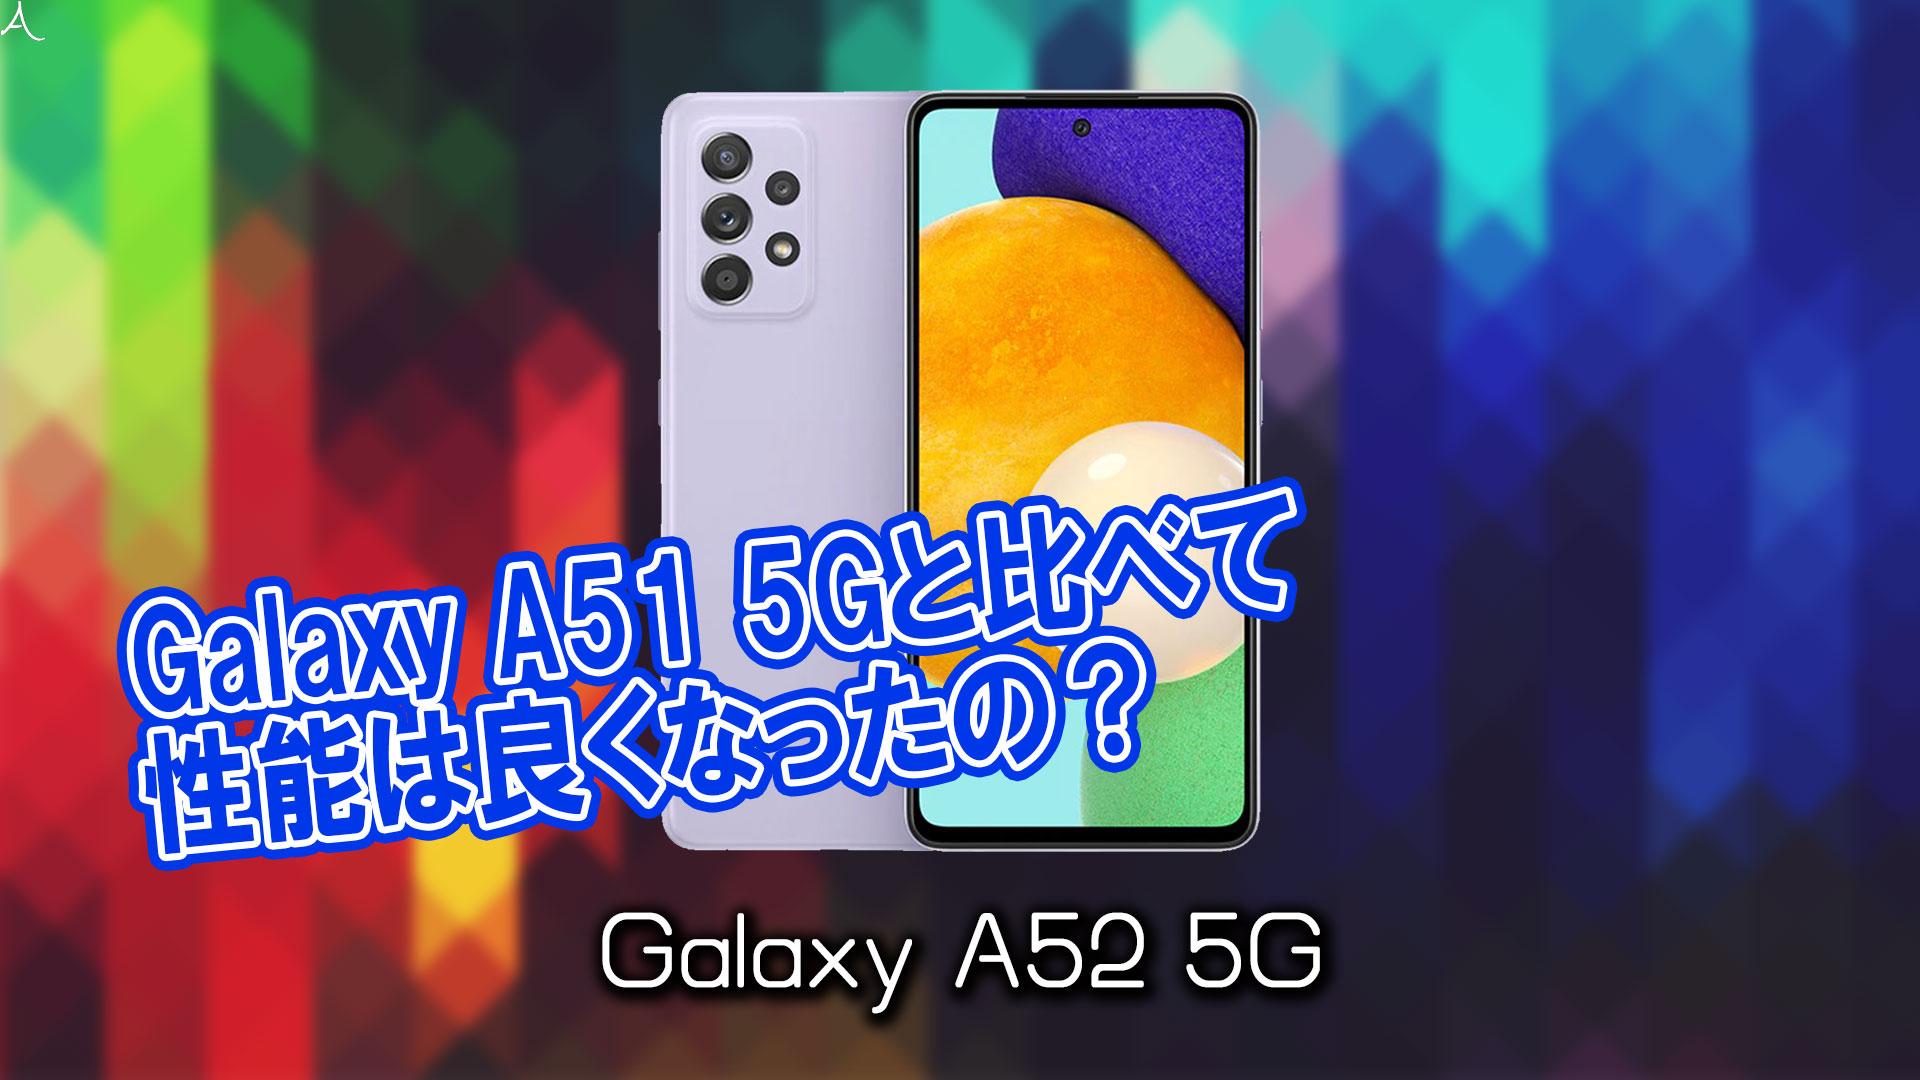 「Galaxy A52 5G」のチップセット(CPU)は何?性能をベンチマーク(Geekbench)で比較